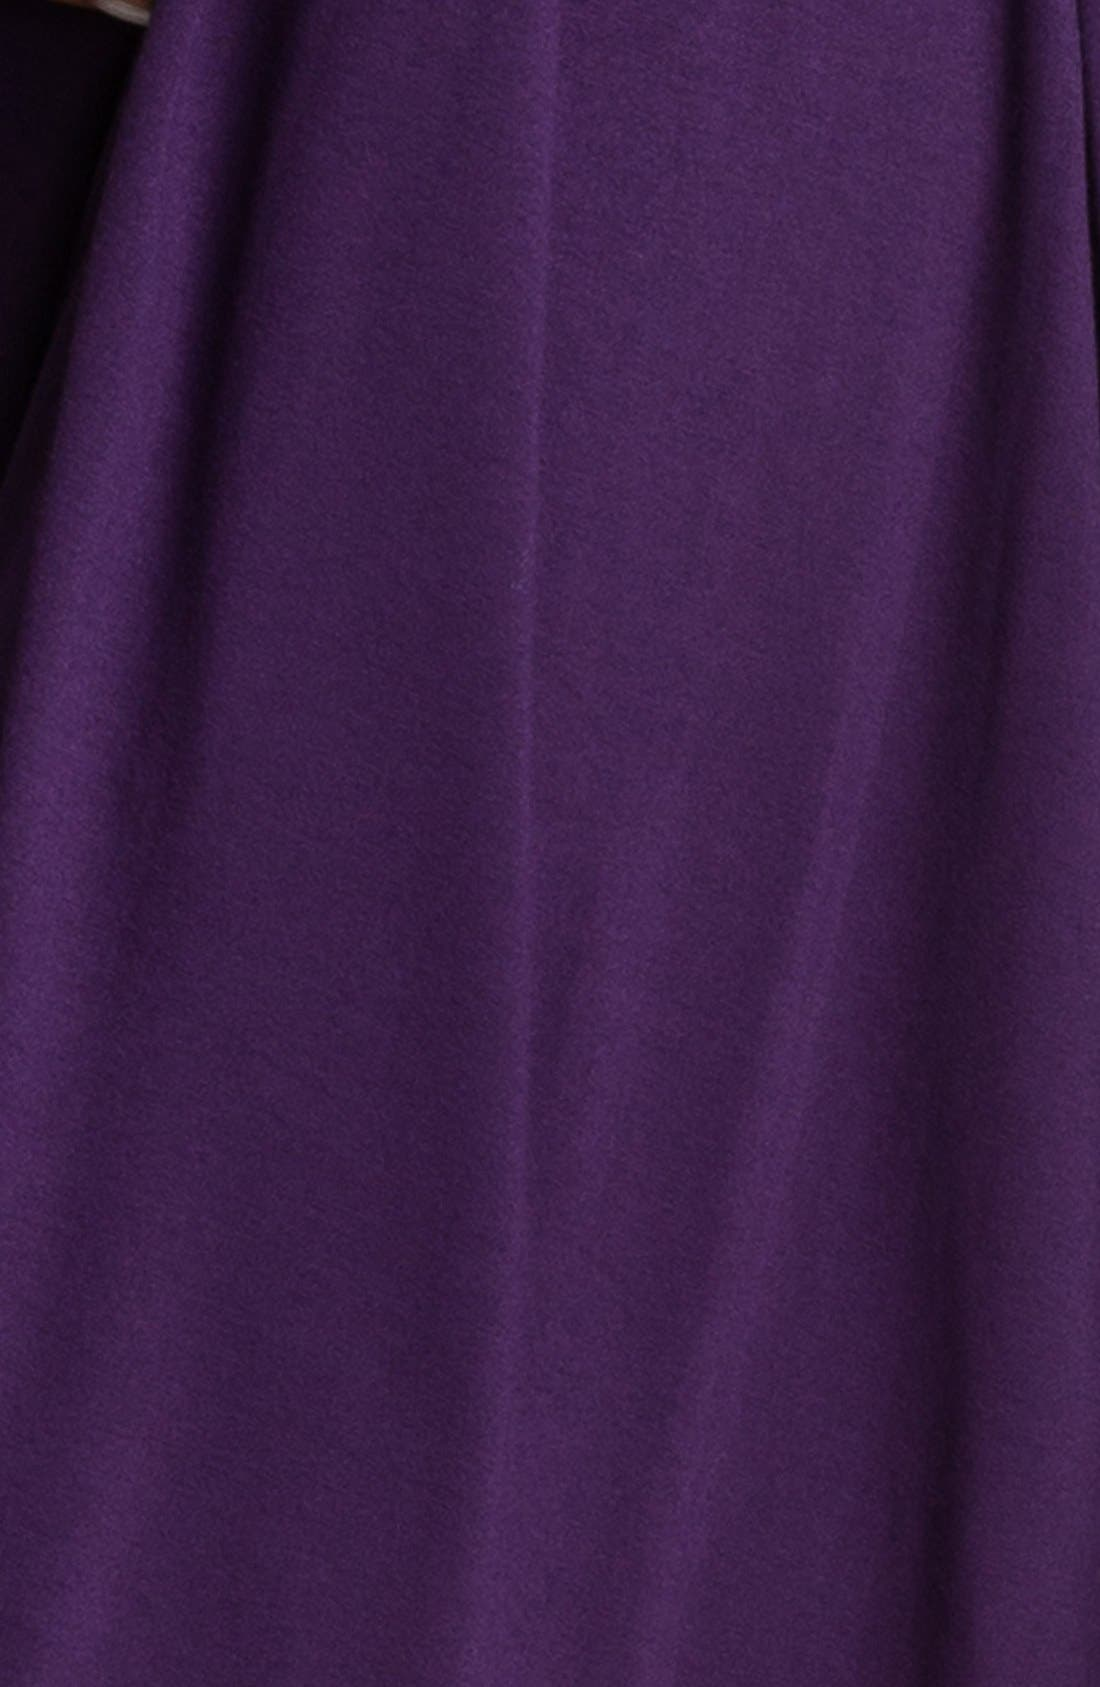 Alternate Image 3  - Olian 'Lucy' Draped Stretch Knit Maternity Dress